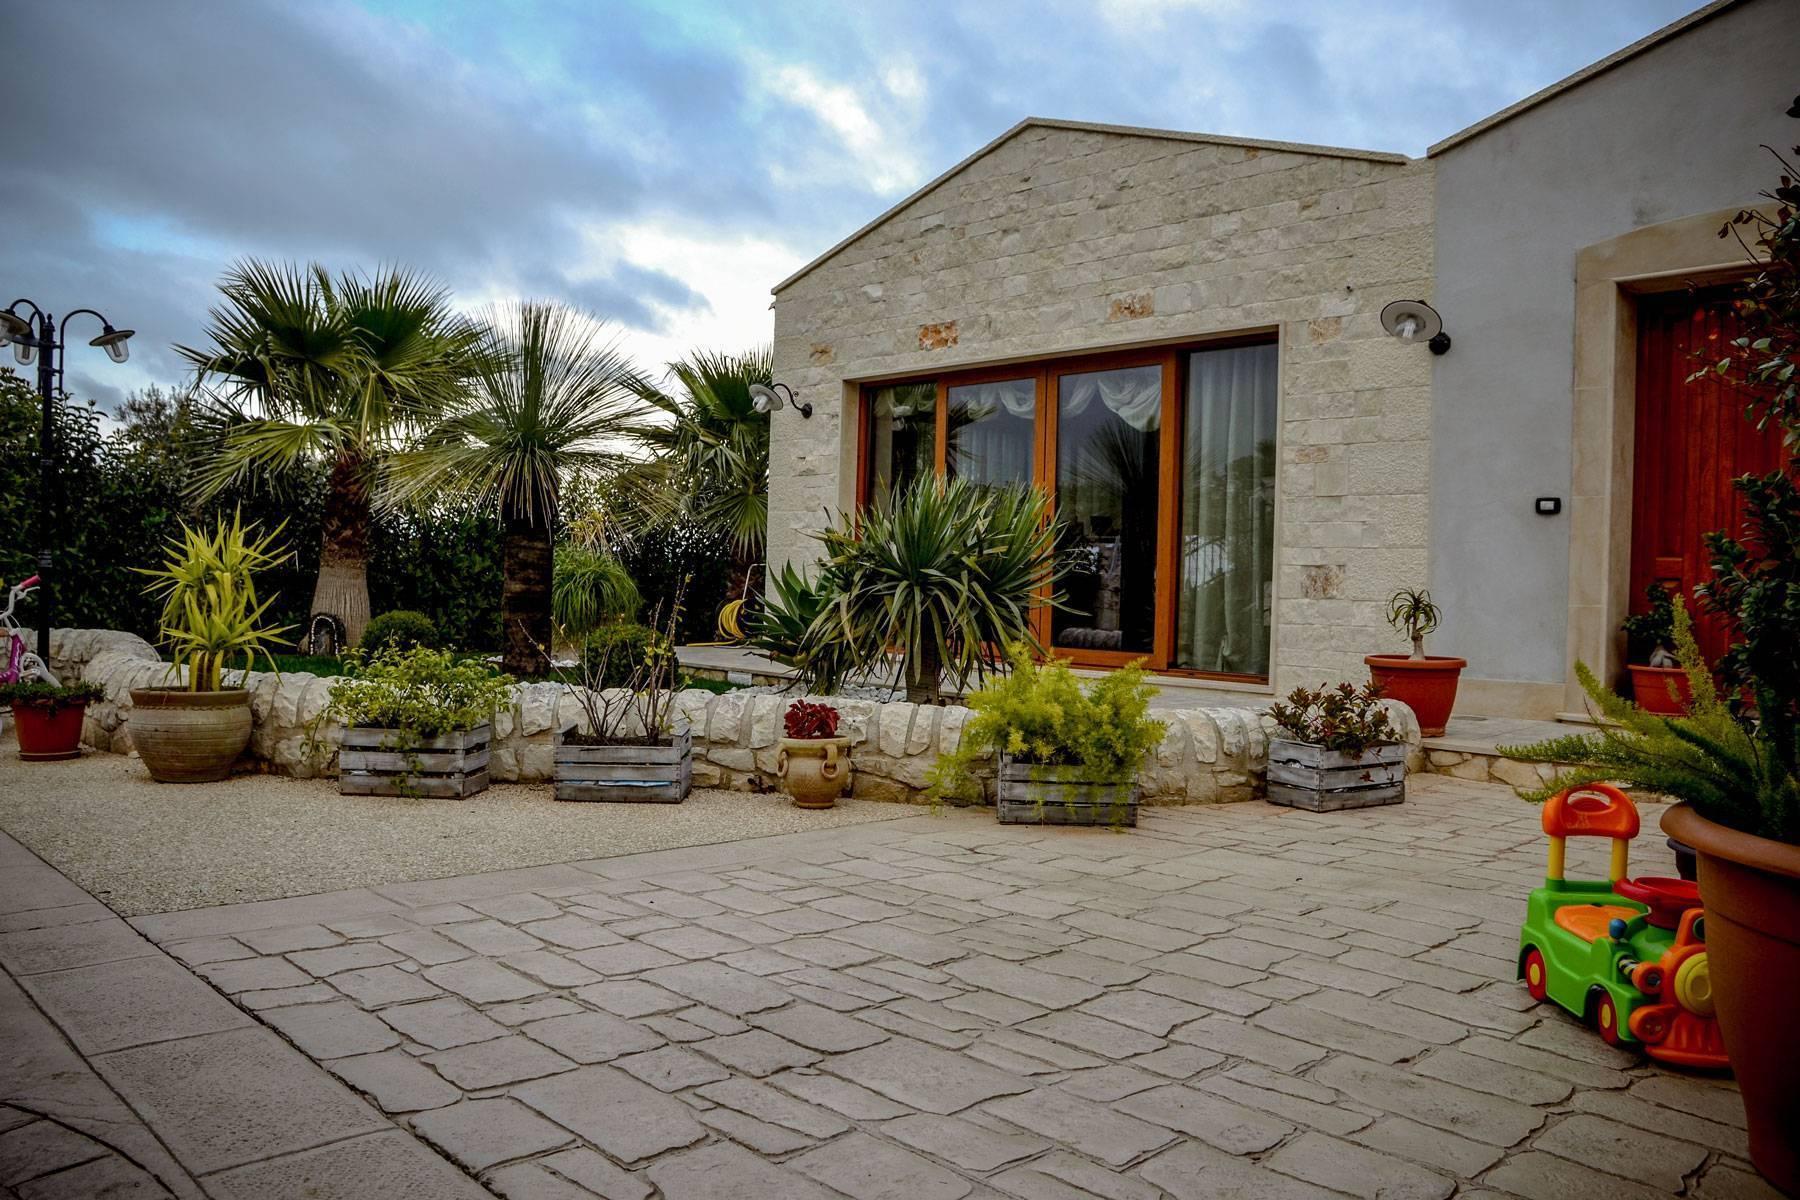 11 ingresso fronte casa / Basole modicane e Ghiaia a Vista / Color pietra